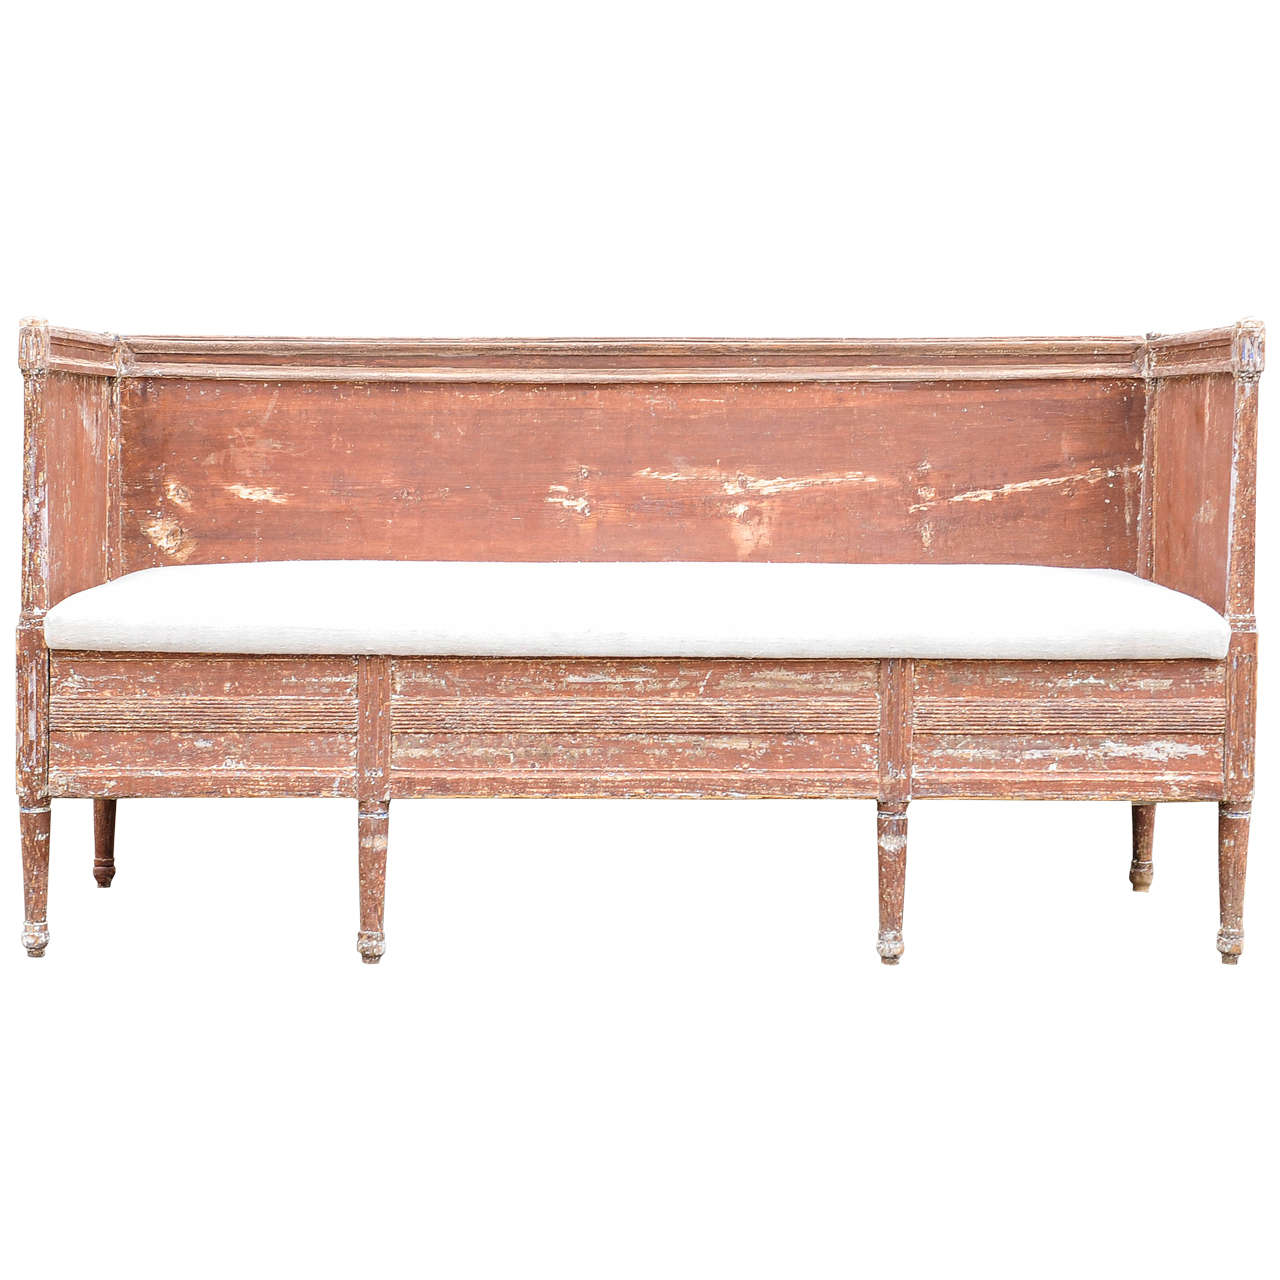 swedish gustavian kitchen bench for sale at 1stdibs